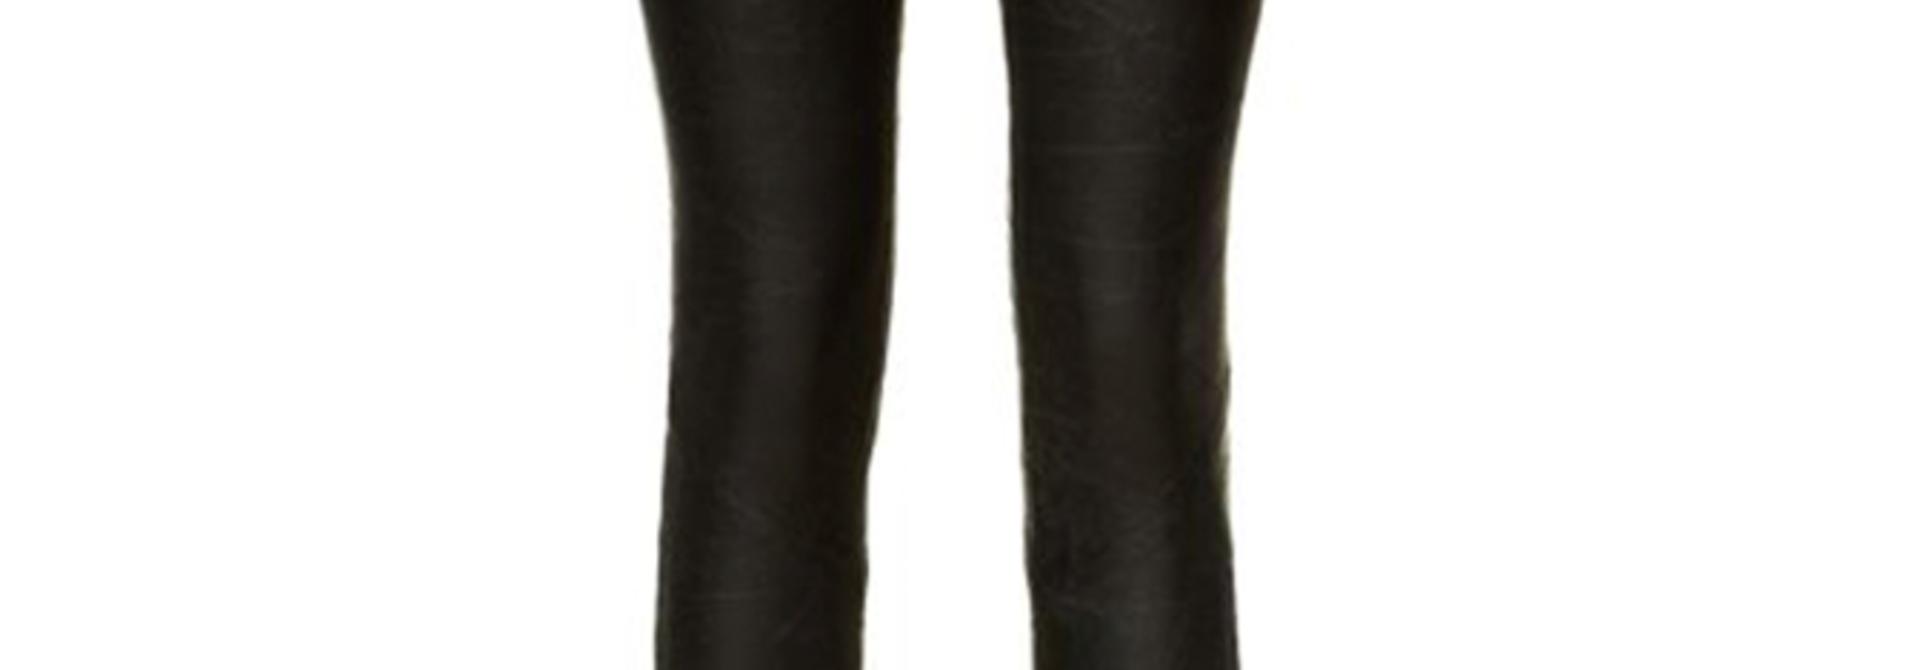 Paige Hoxton ultra skinny 3339A13-1086 black